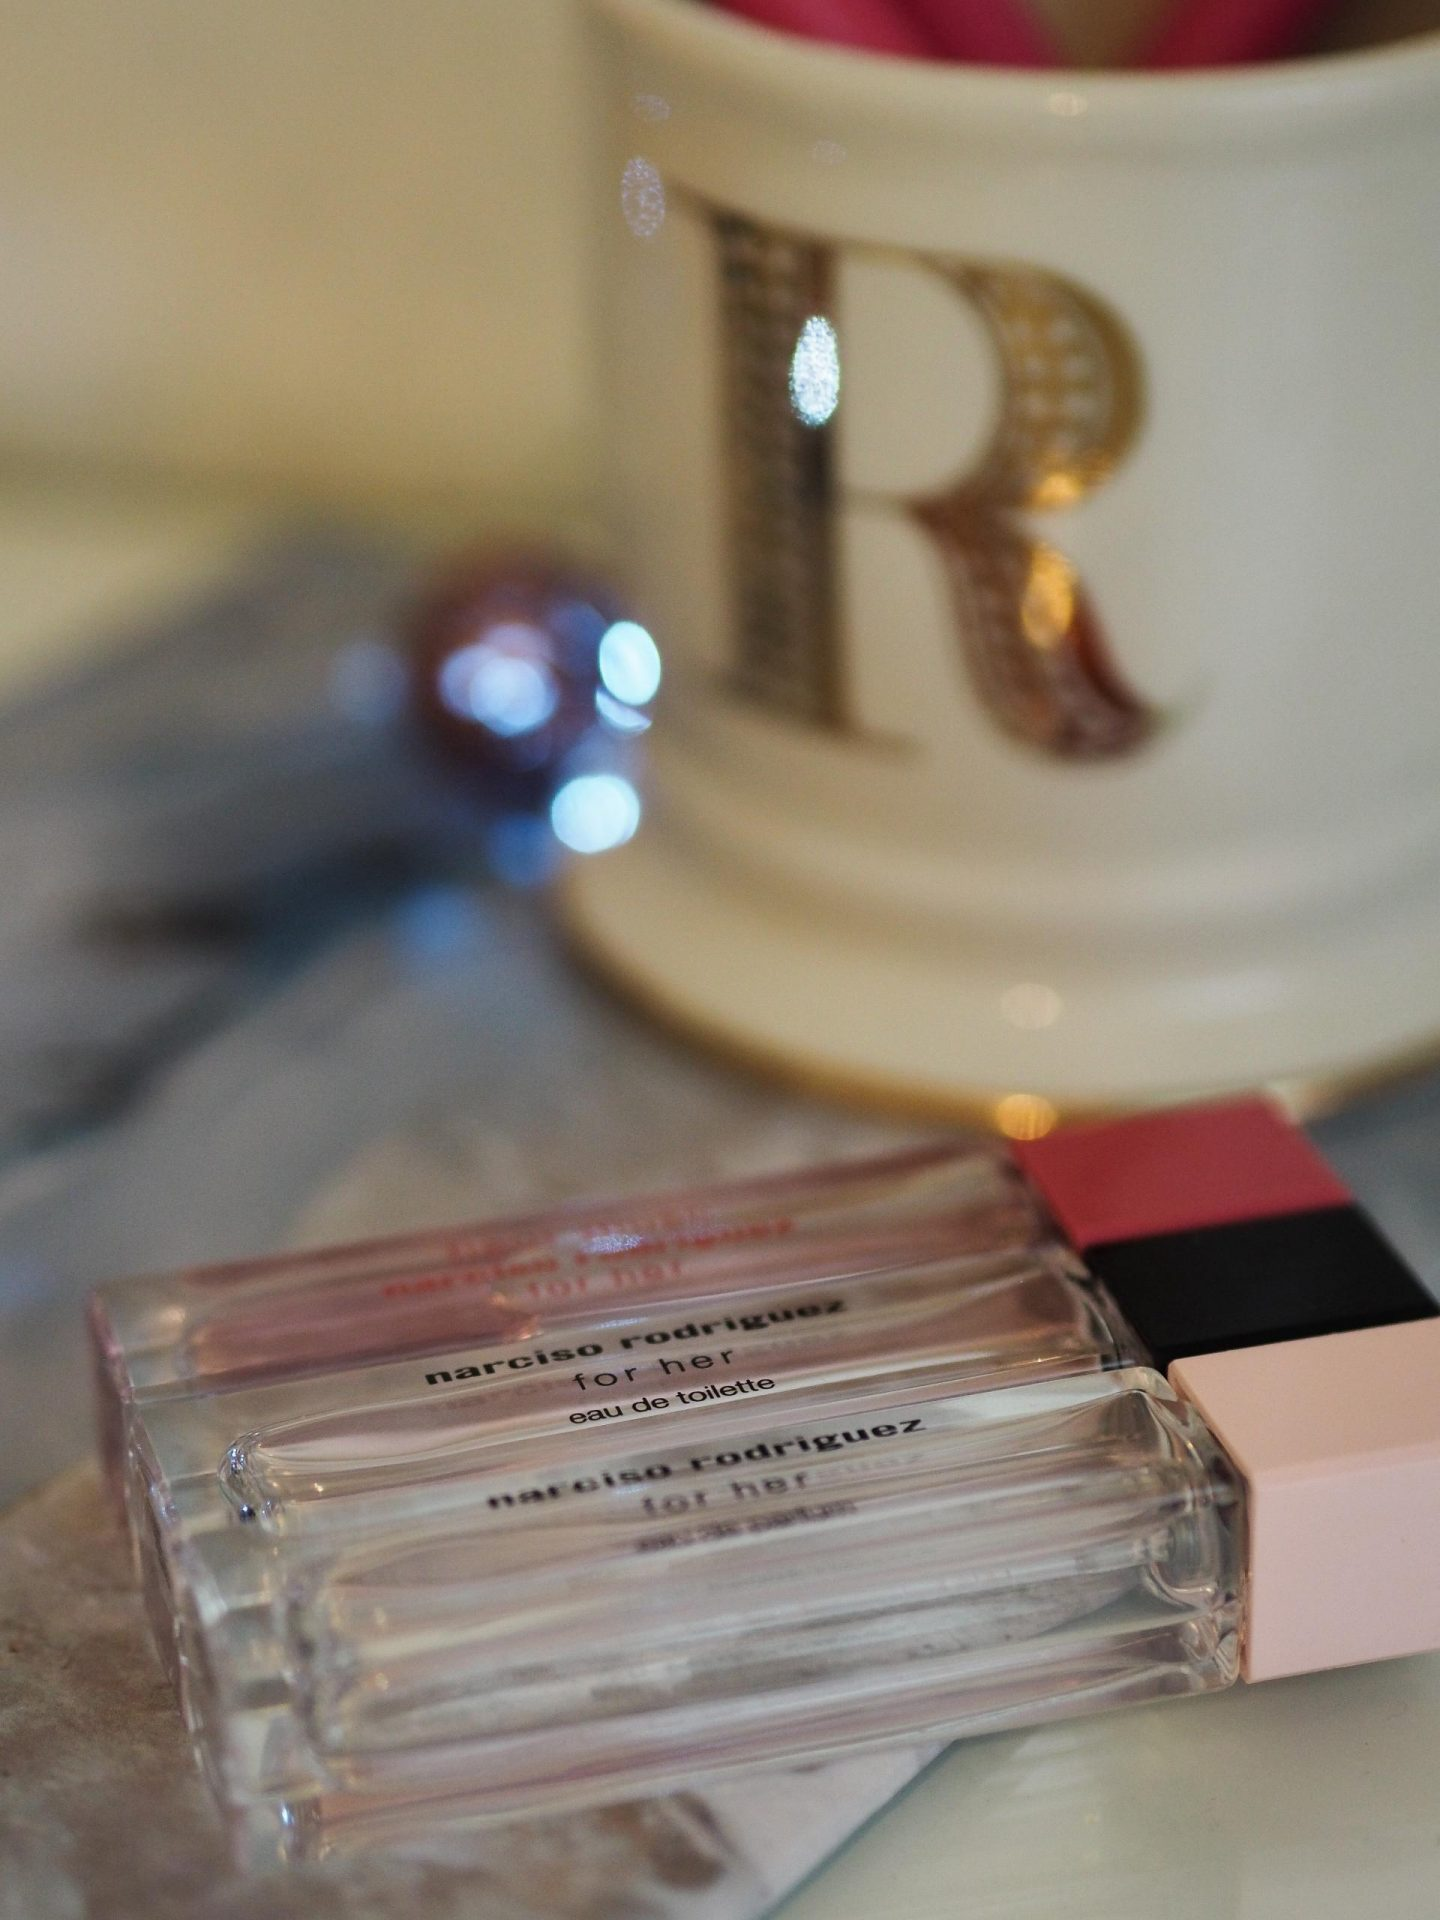 Narciso Rodriguez Perfume Trio, My Current Beauty Favourites - Rachel Nicole UK Blogger